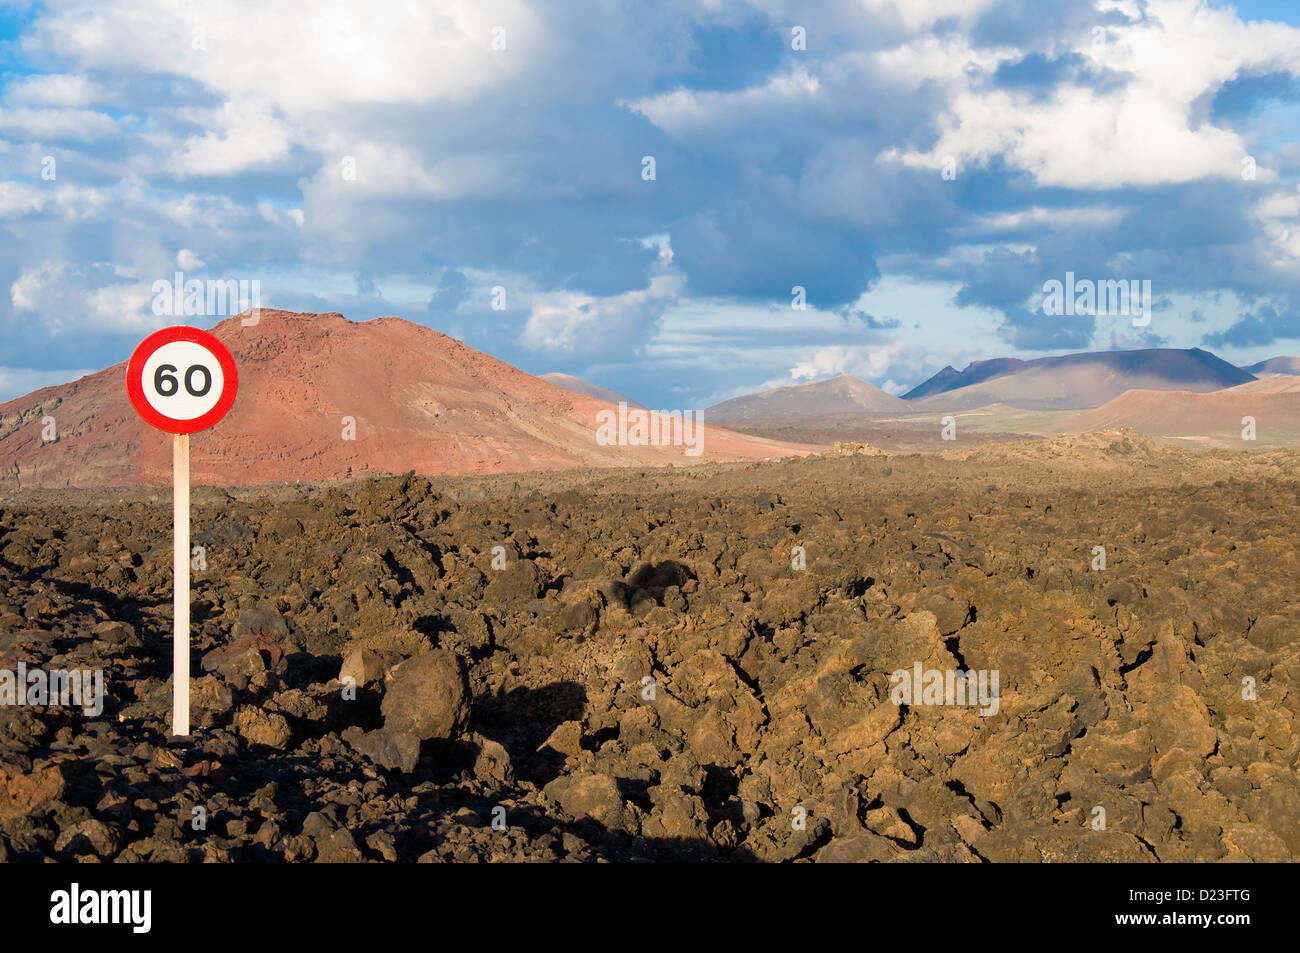 Lava Field, Lanzarote, Canary Islands, Spain - Stock Image